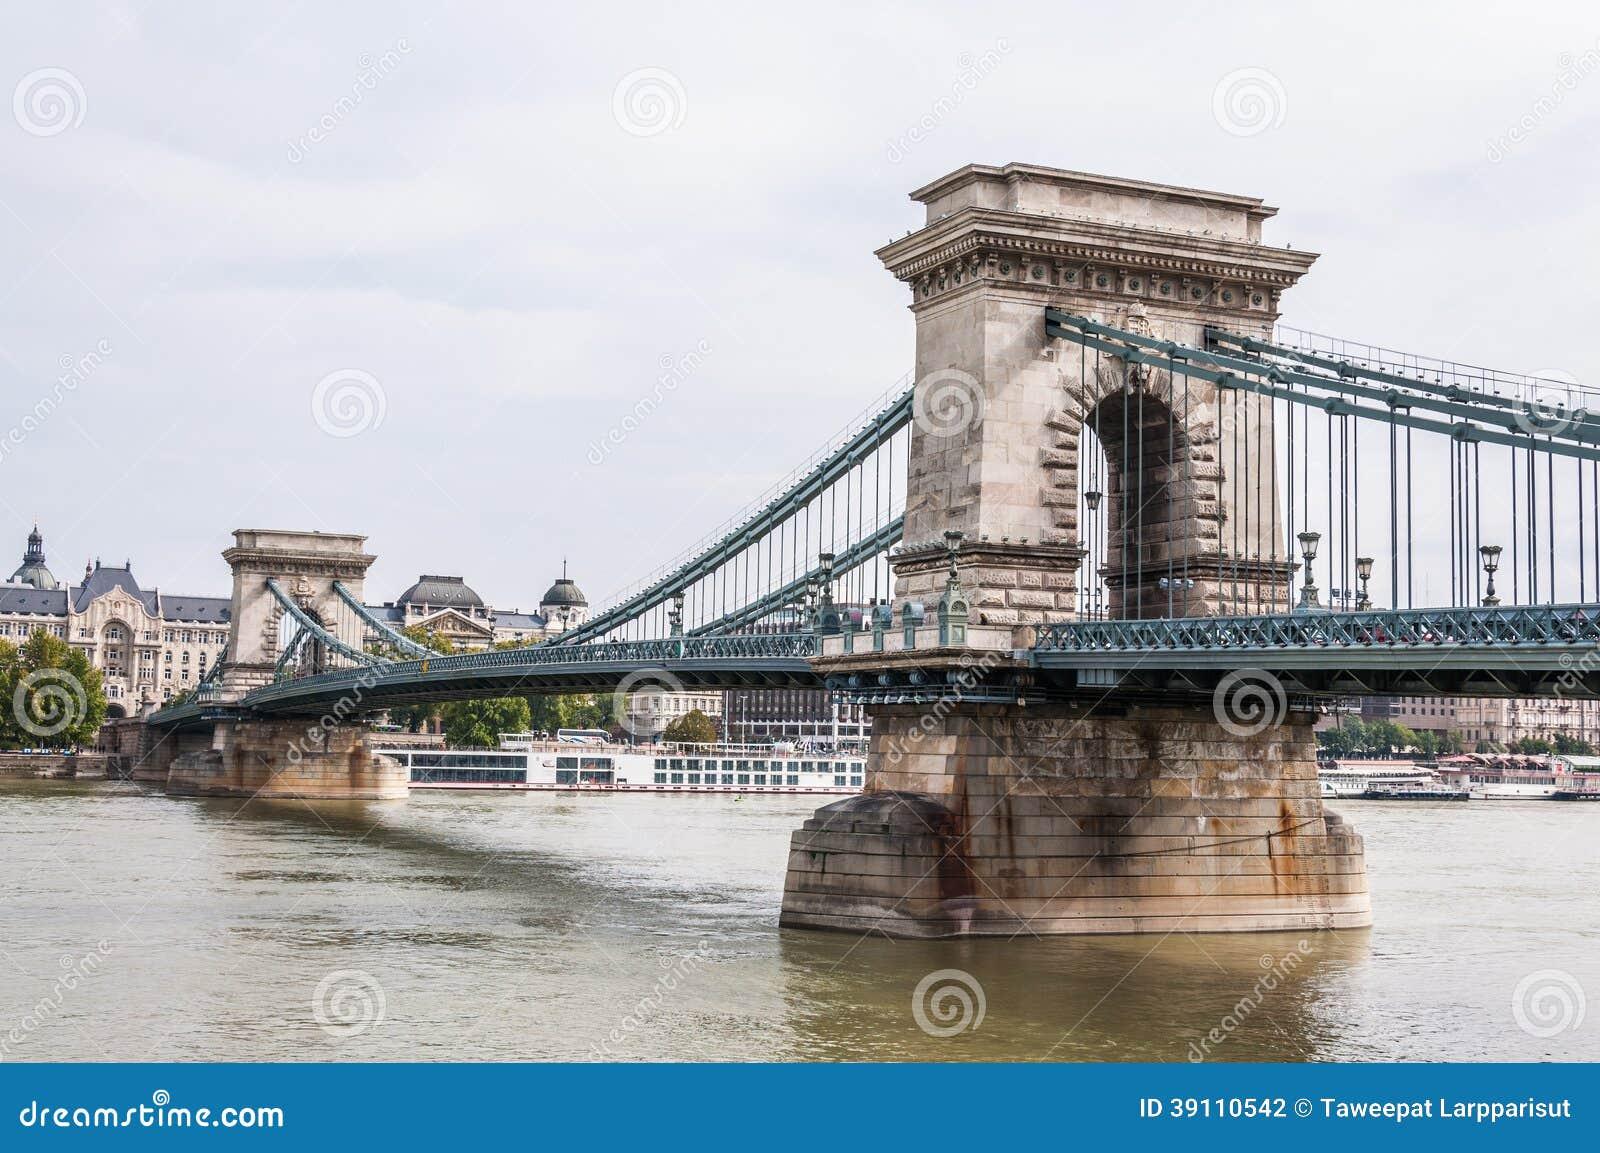 Kettingsbrug over de rivier van Donau